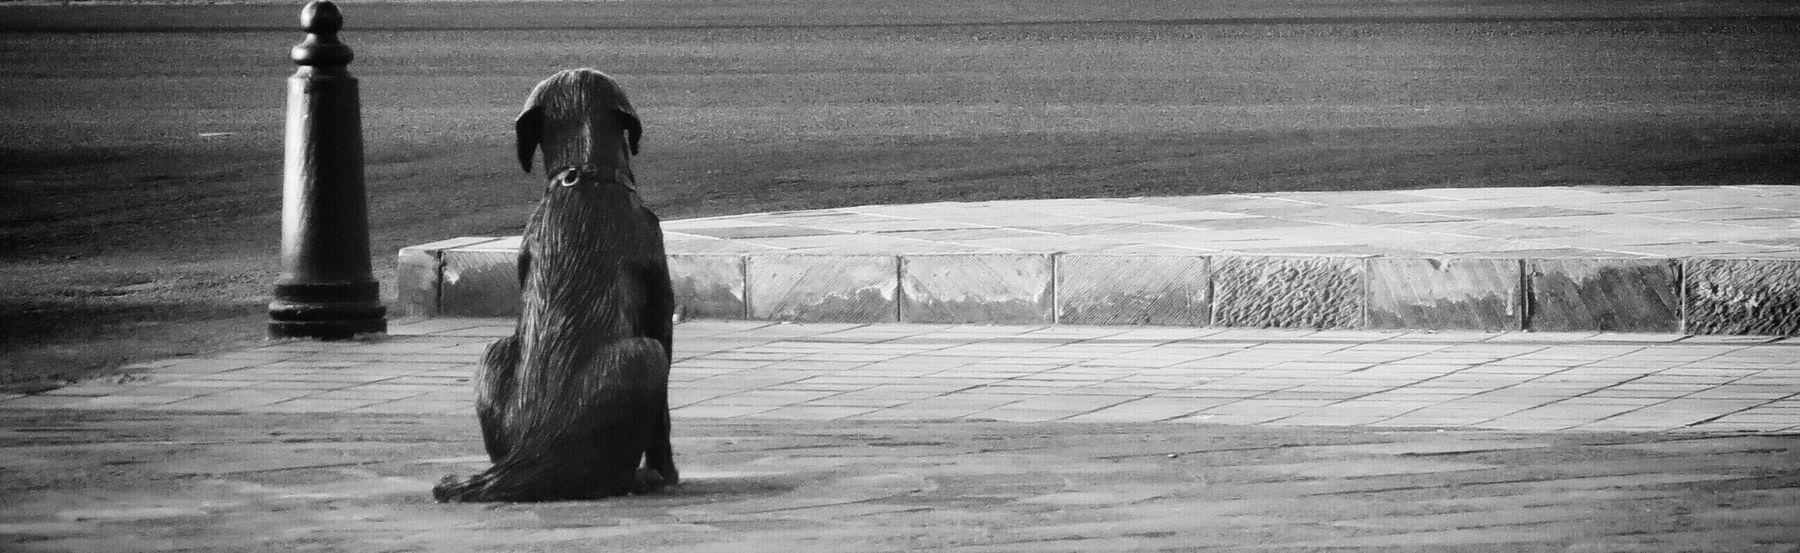 B&w Street Photography Dog statue on pasteur/zaragoza street, here in Queretaro,Mexico Blackandwhite Elperroartista Everybodystreet